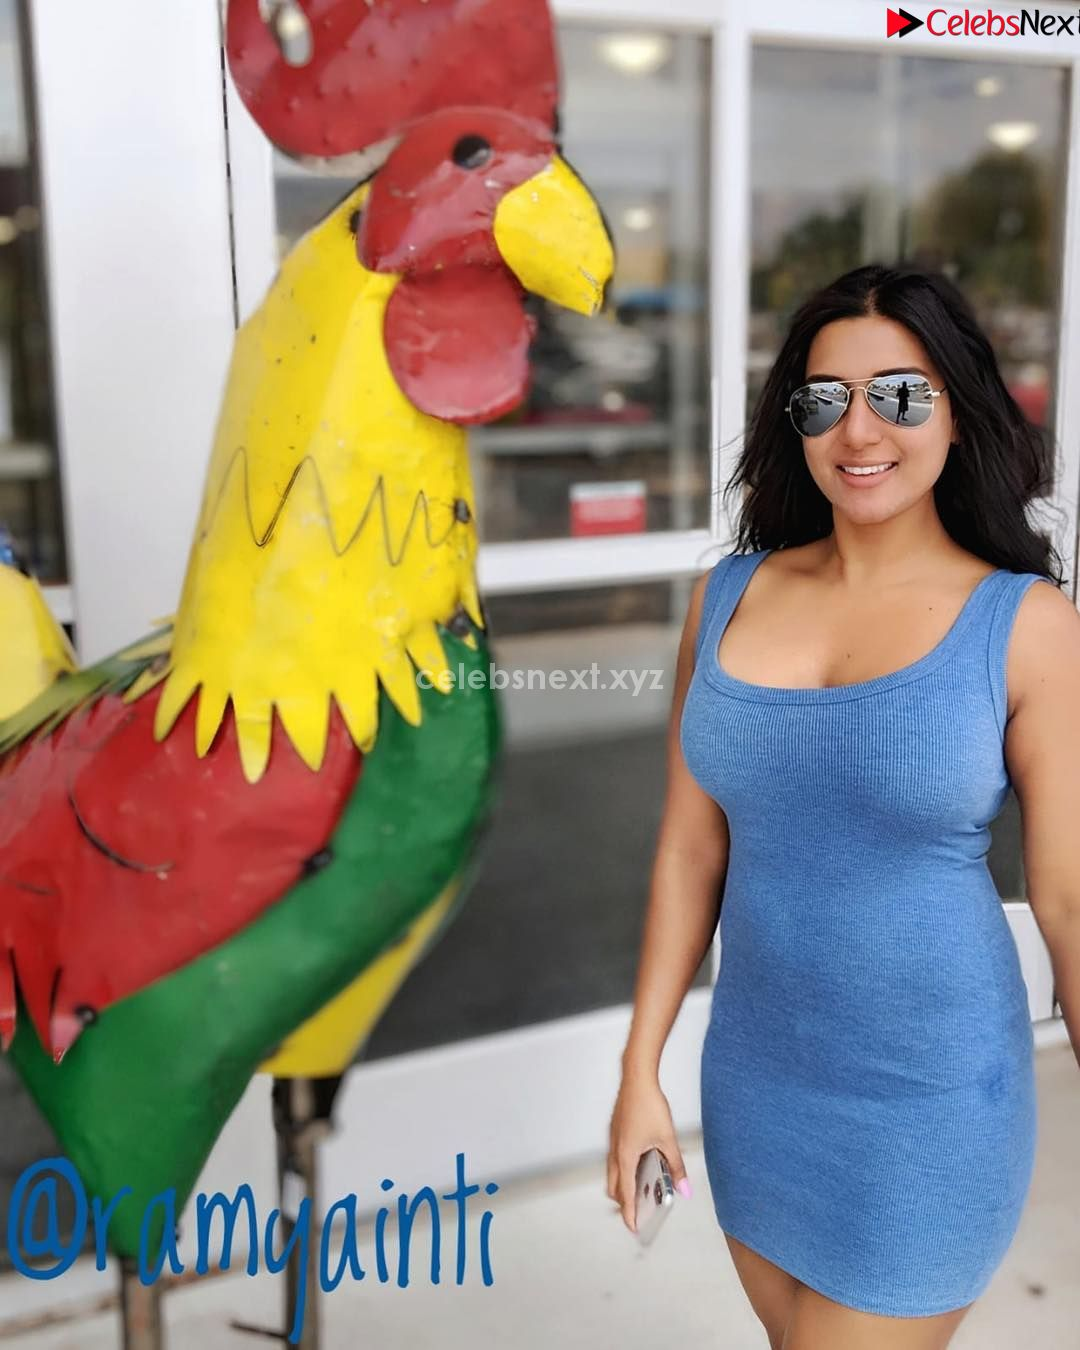 Ramya Inti Spicy Cute Plus Size Indian model stunning Fitness Beauty July 2018 ~ CelebsNext.xyz Exclusive Celebrity Pics